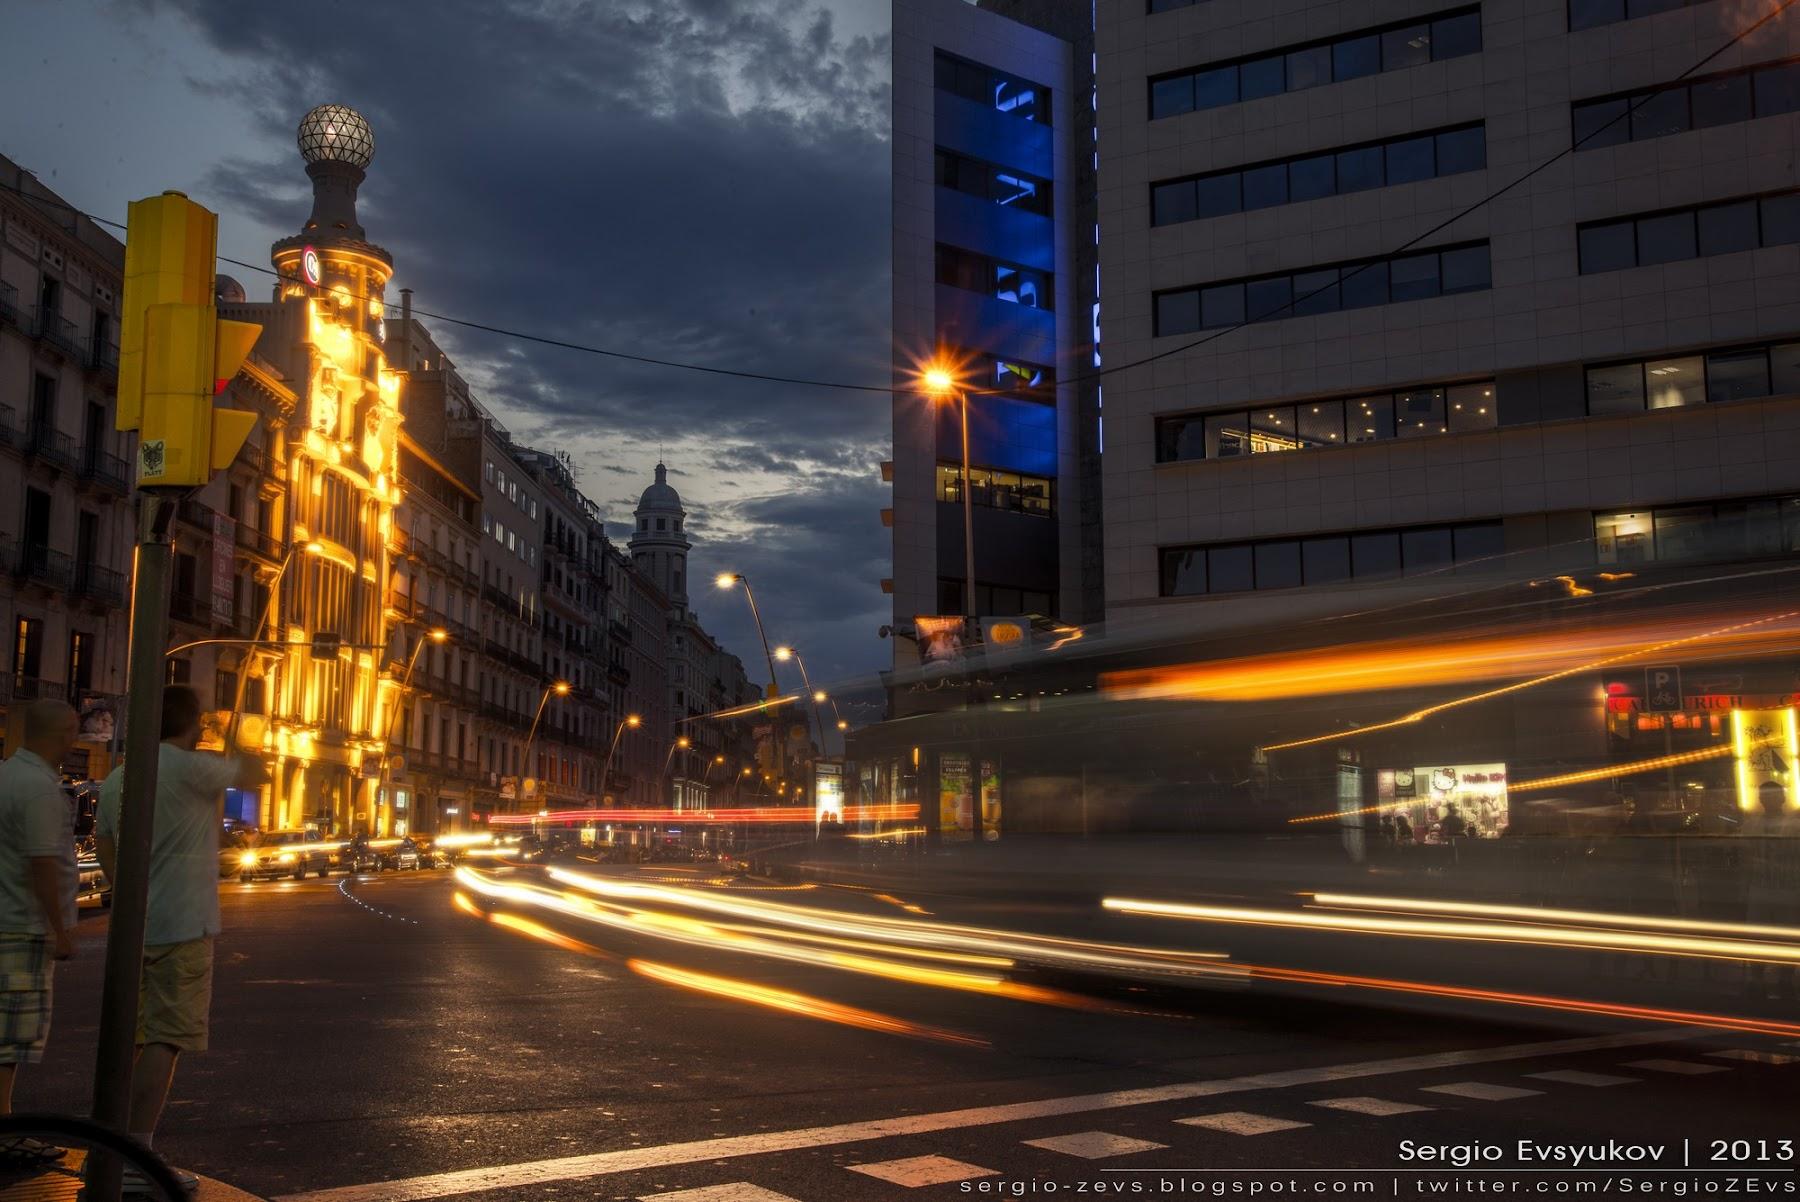 Carrer de Pelai at night